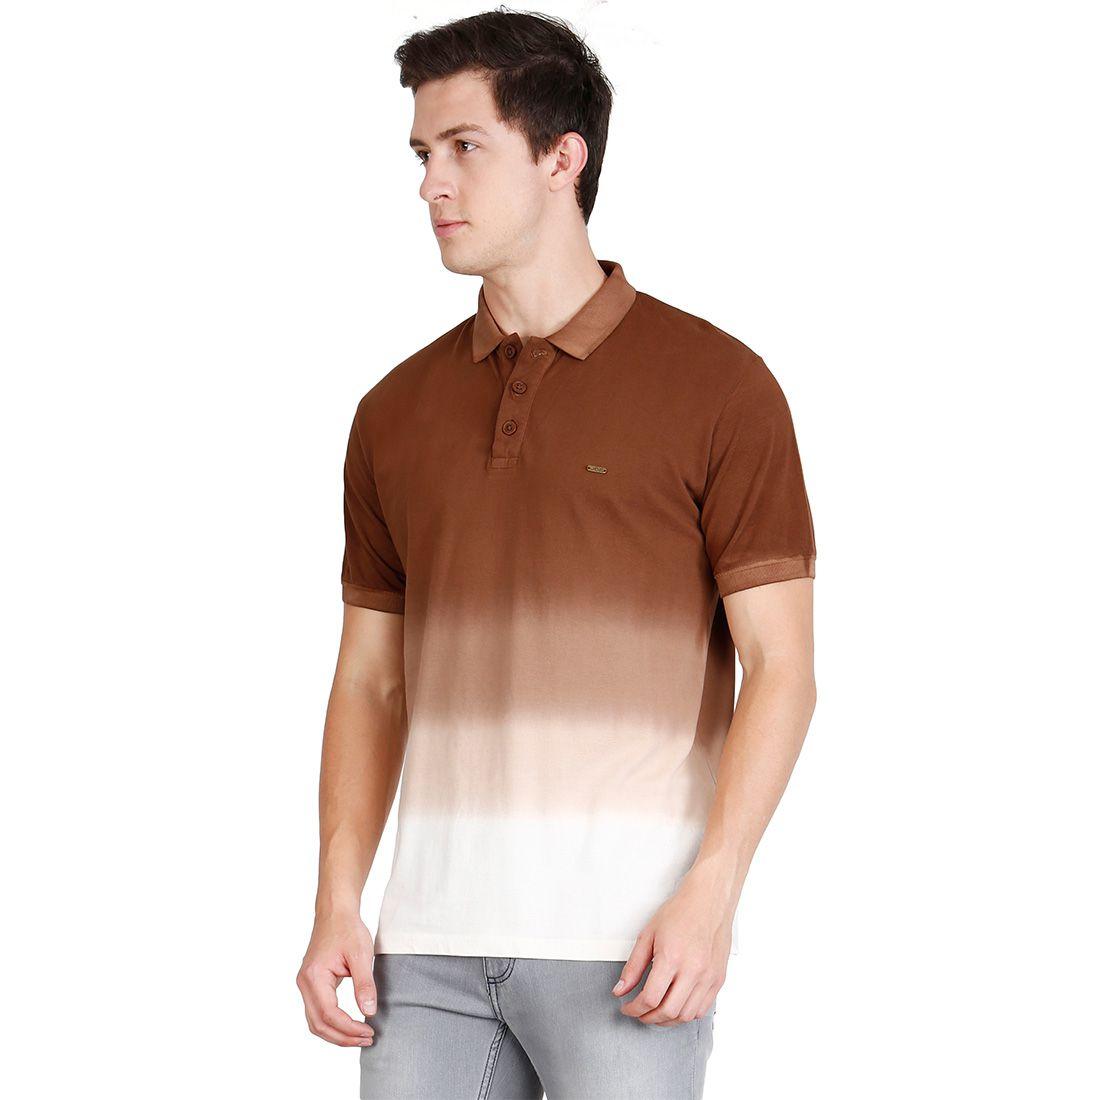 JDC Multi Round T-Shirt Pack of 1